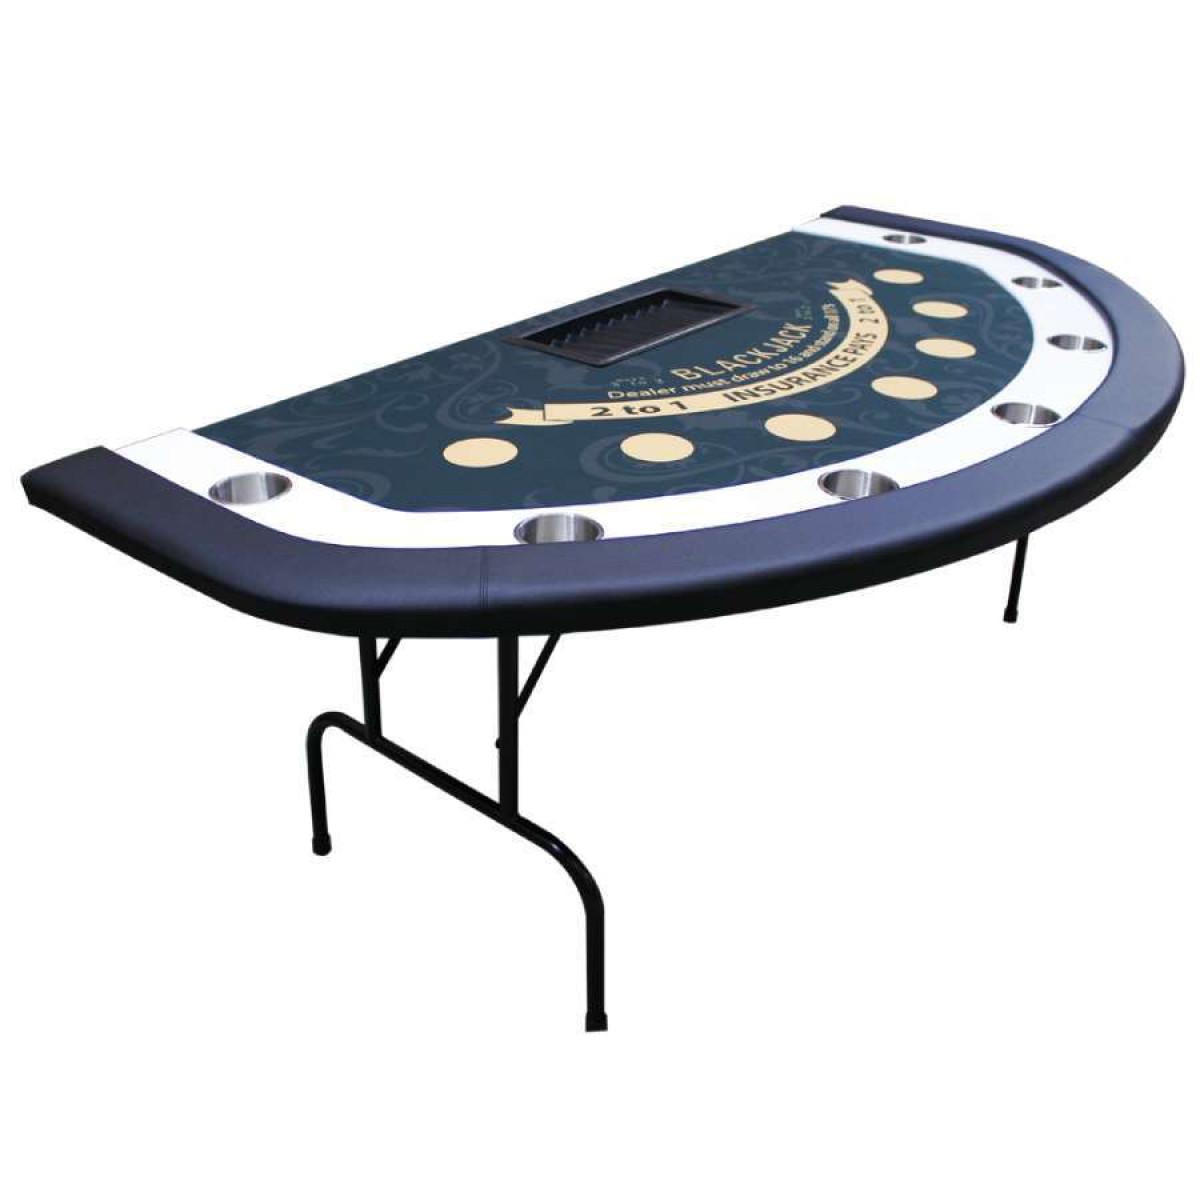 Blackjack table top felt